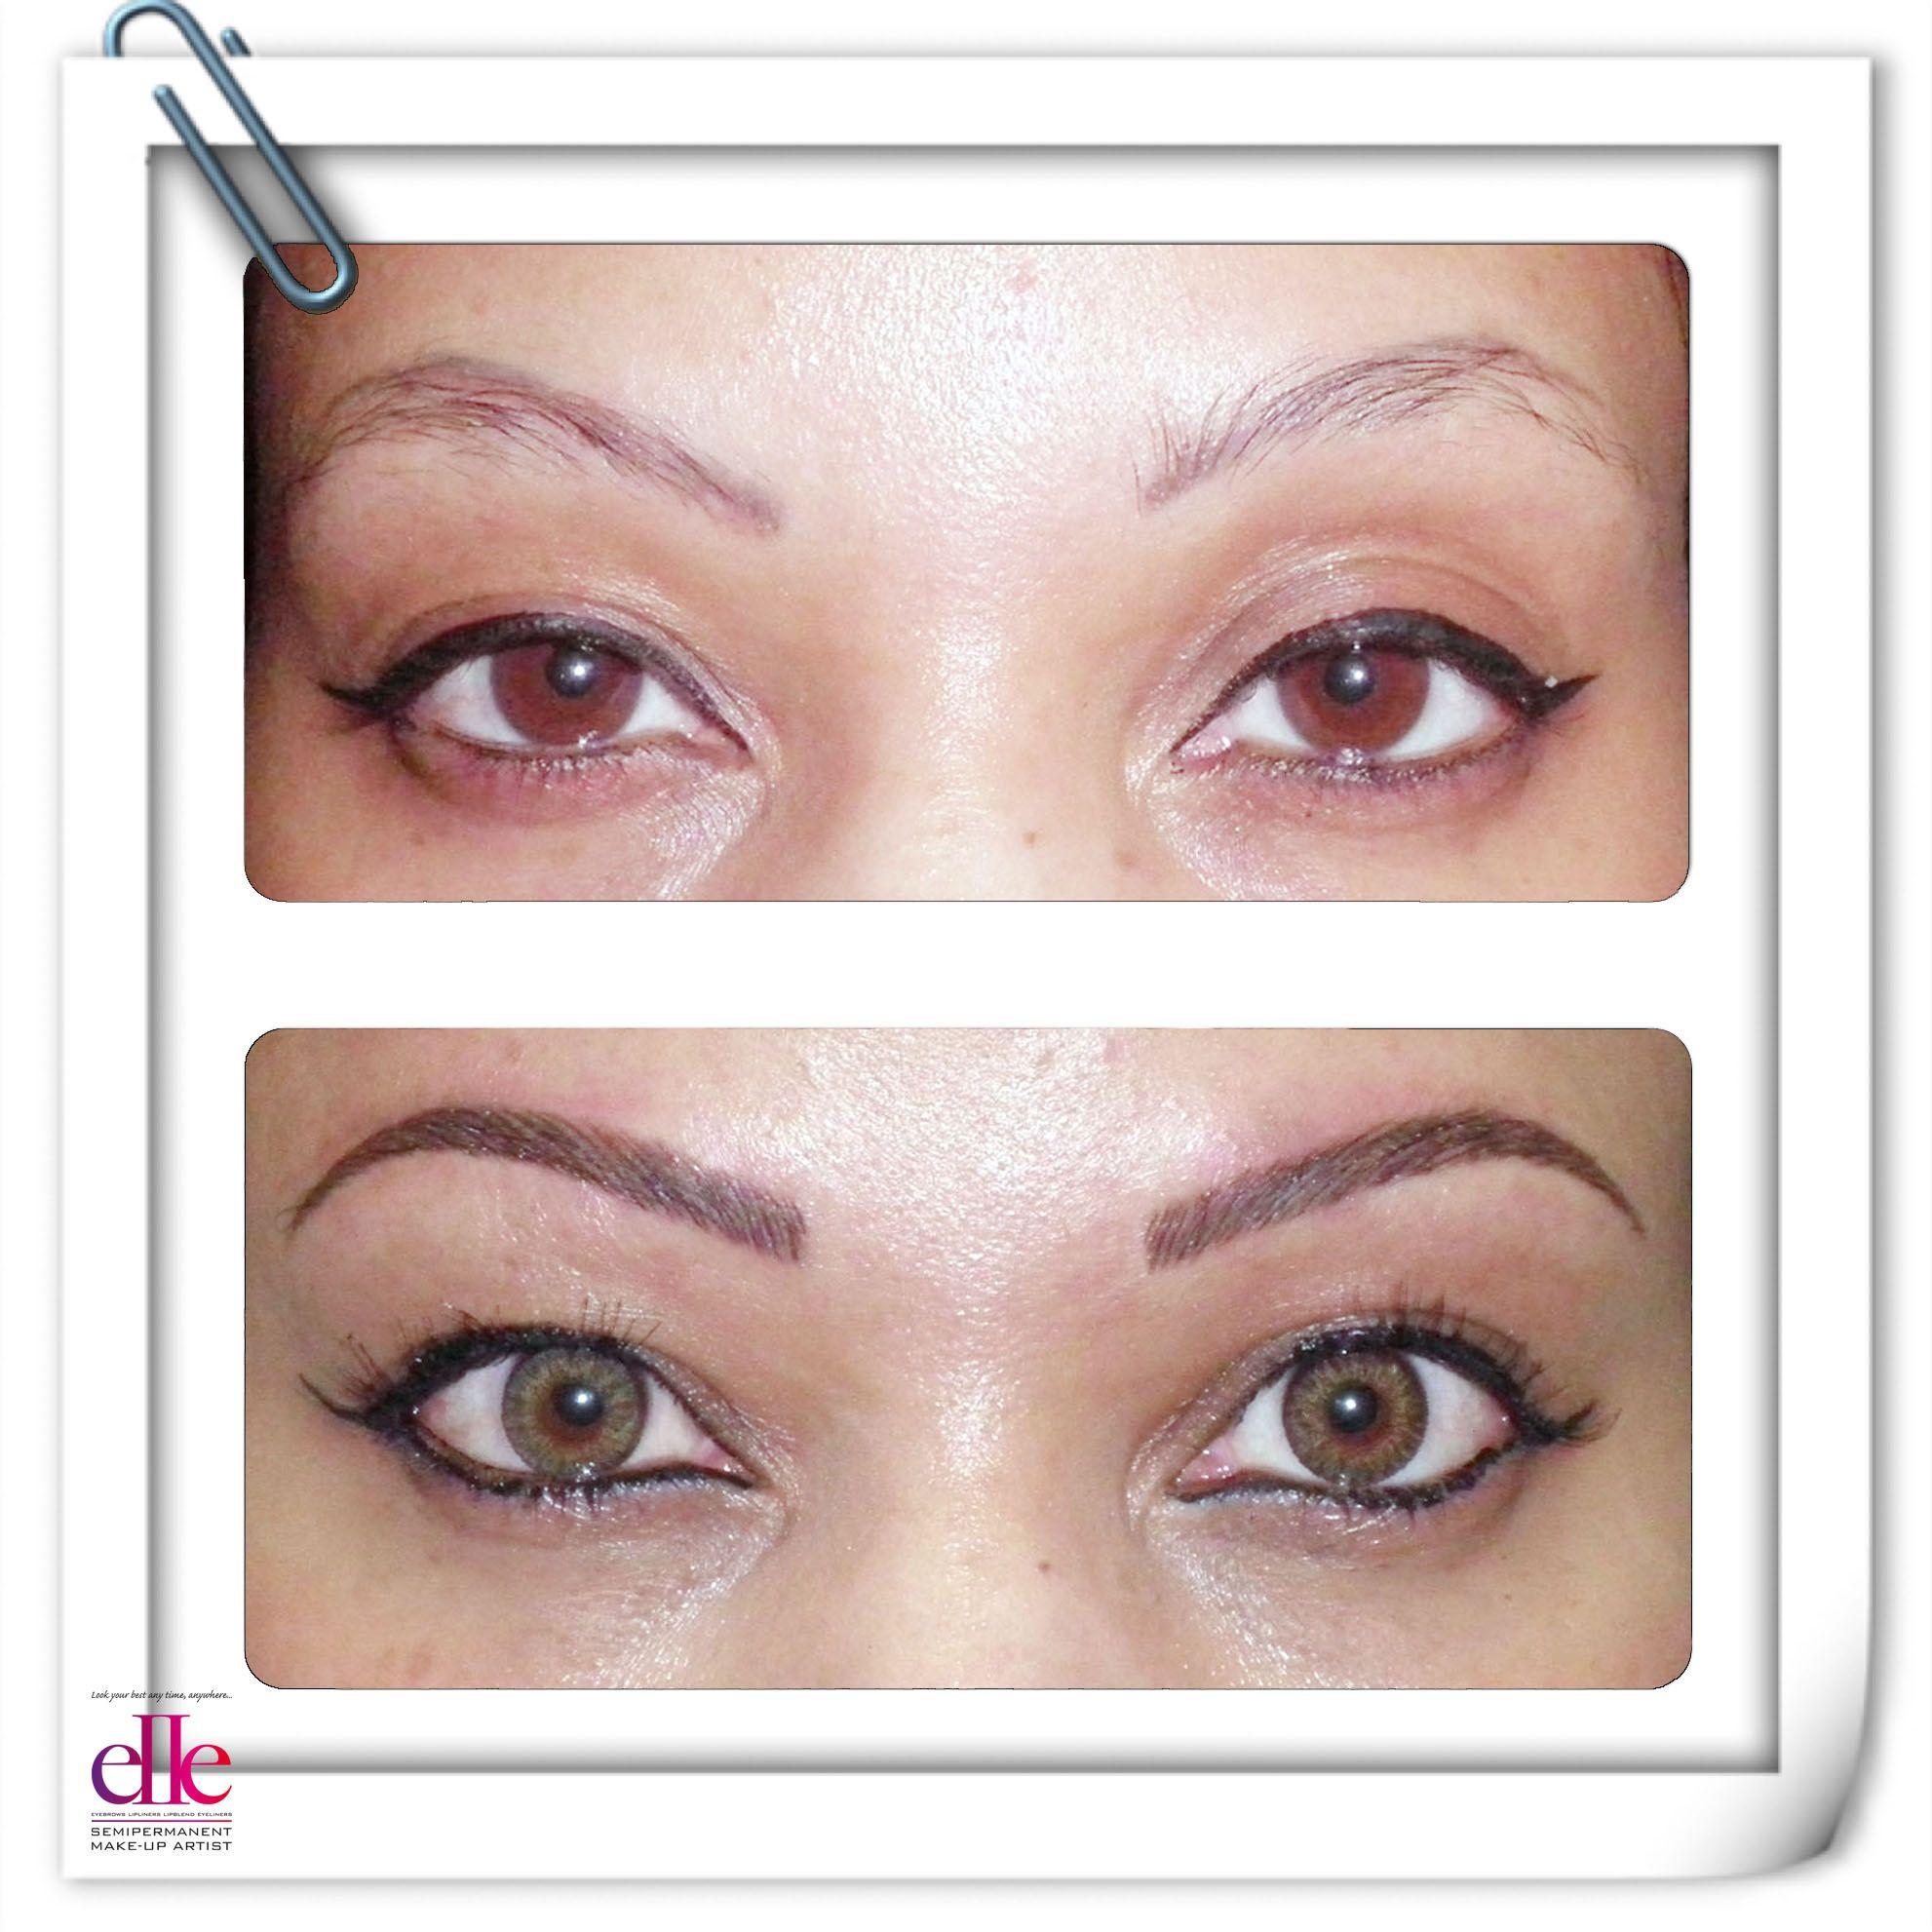 eBay Sponsored Semi Permanent Makeup Eyebrow Color Fading